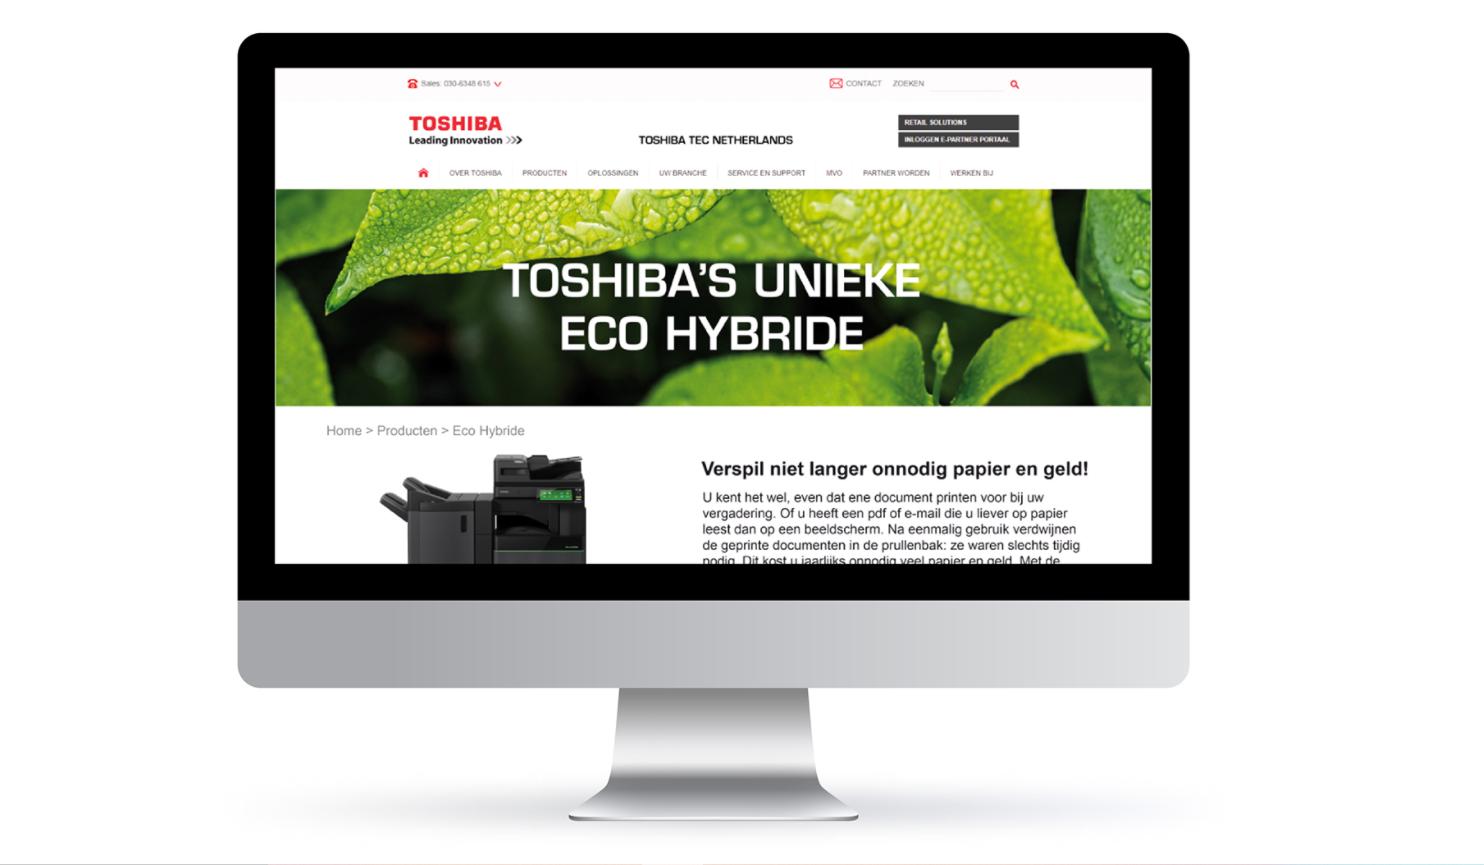 Toshiba's unieke eco hybride